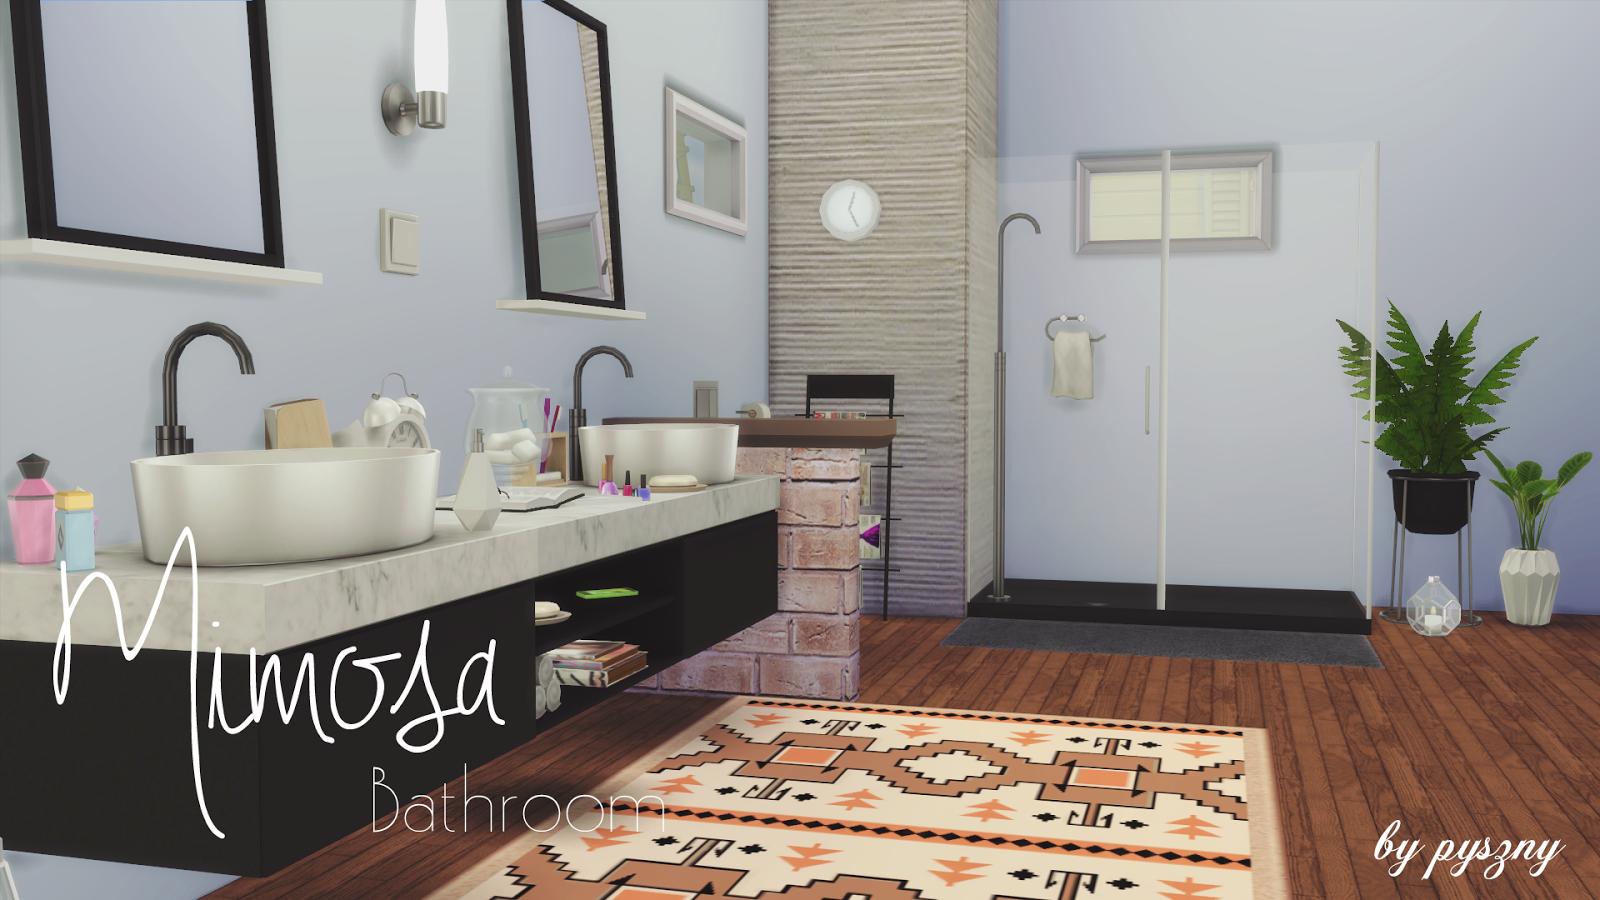 Mimosa Bathroom set! on setzer design, dj design, blue sky design, l.a. design, pi design, er design, ns design, berserk design, dy design, color design,